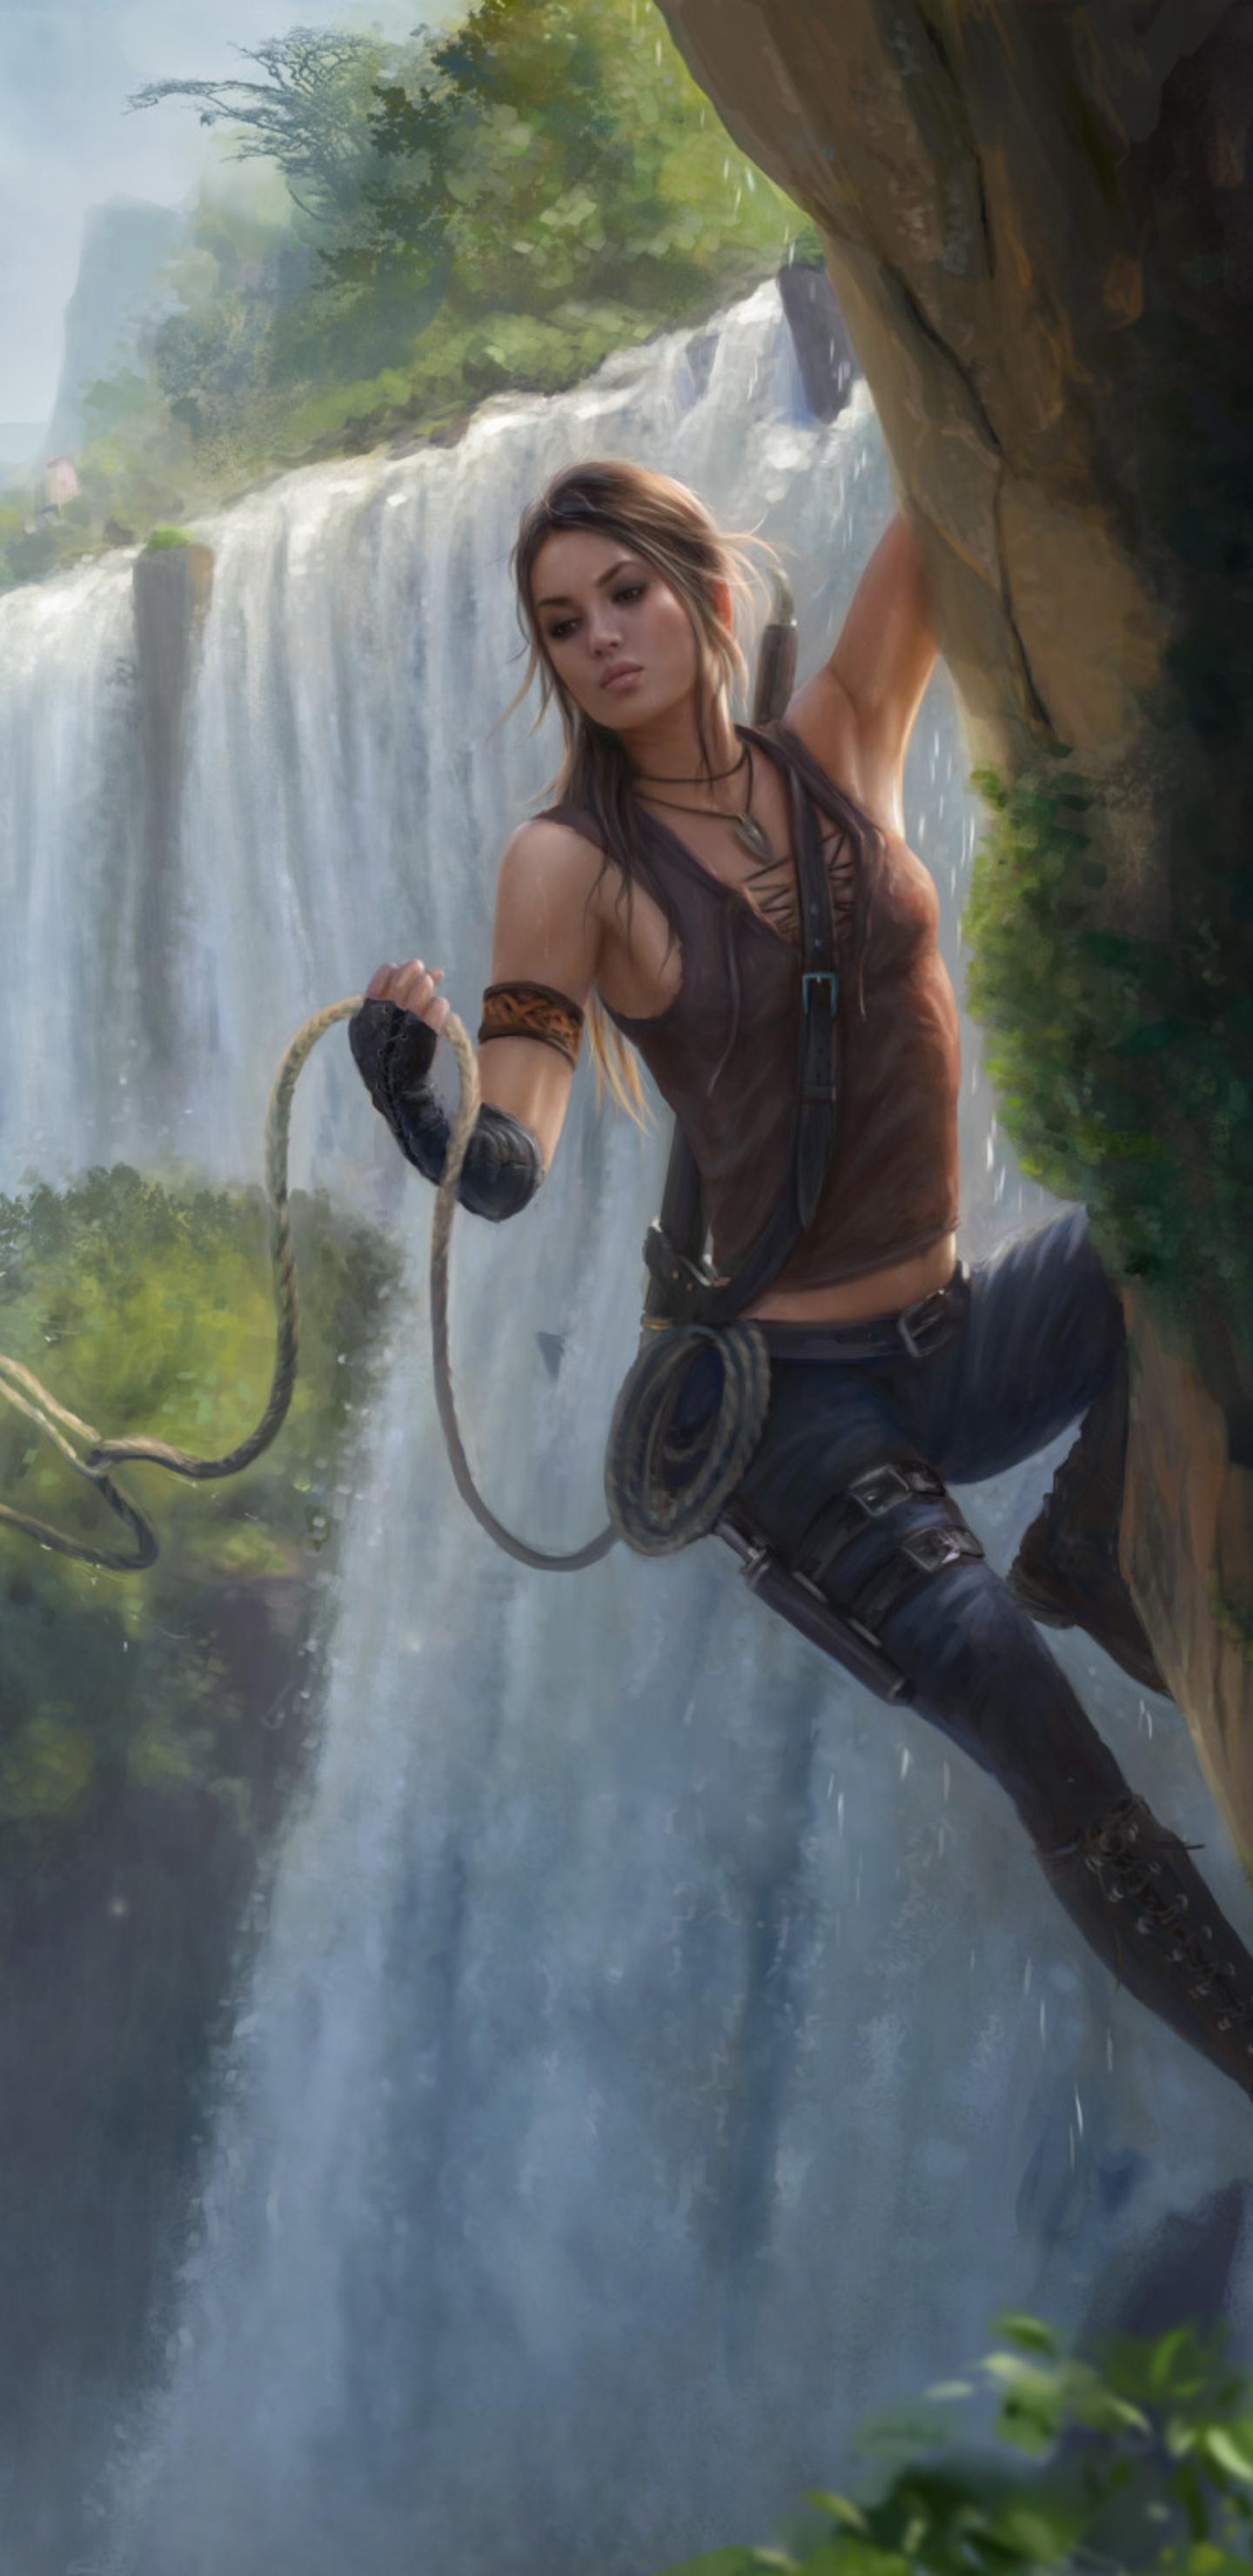 fantasy-girl-climbing-through-the-waterfall-fe.jpg